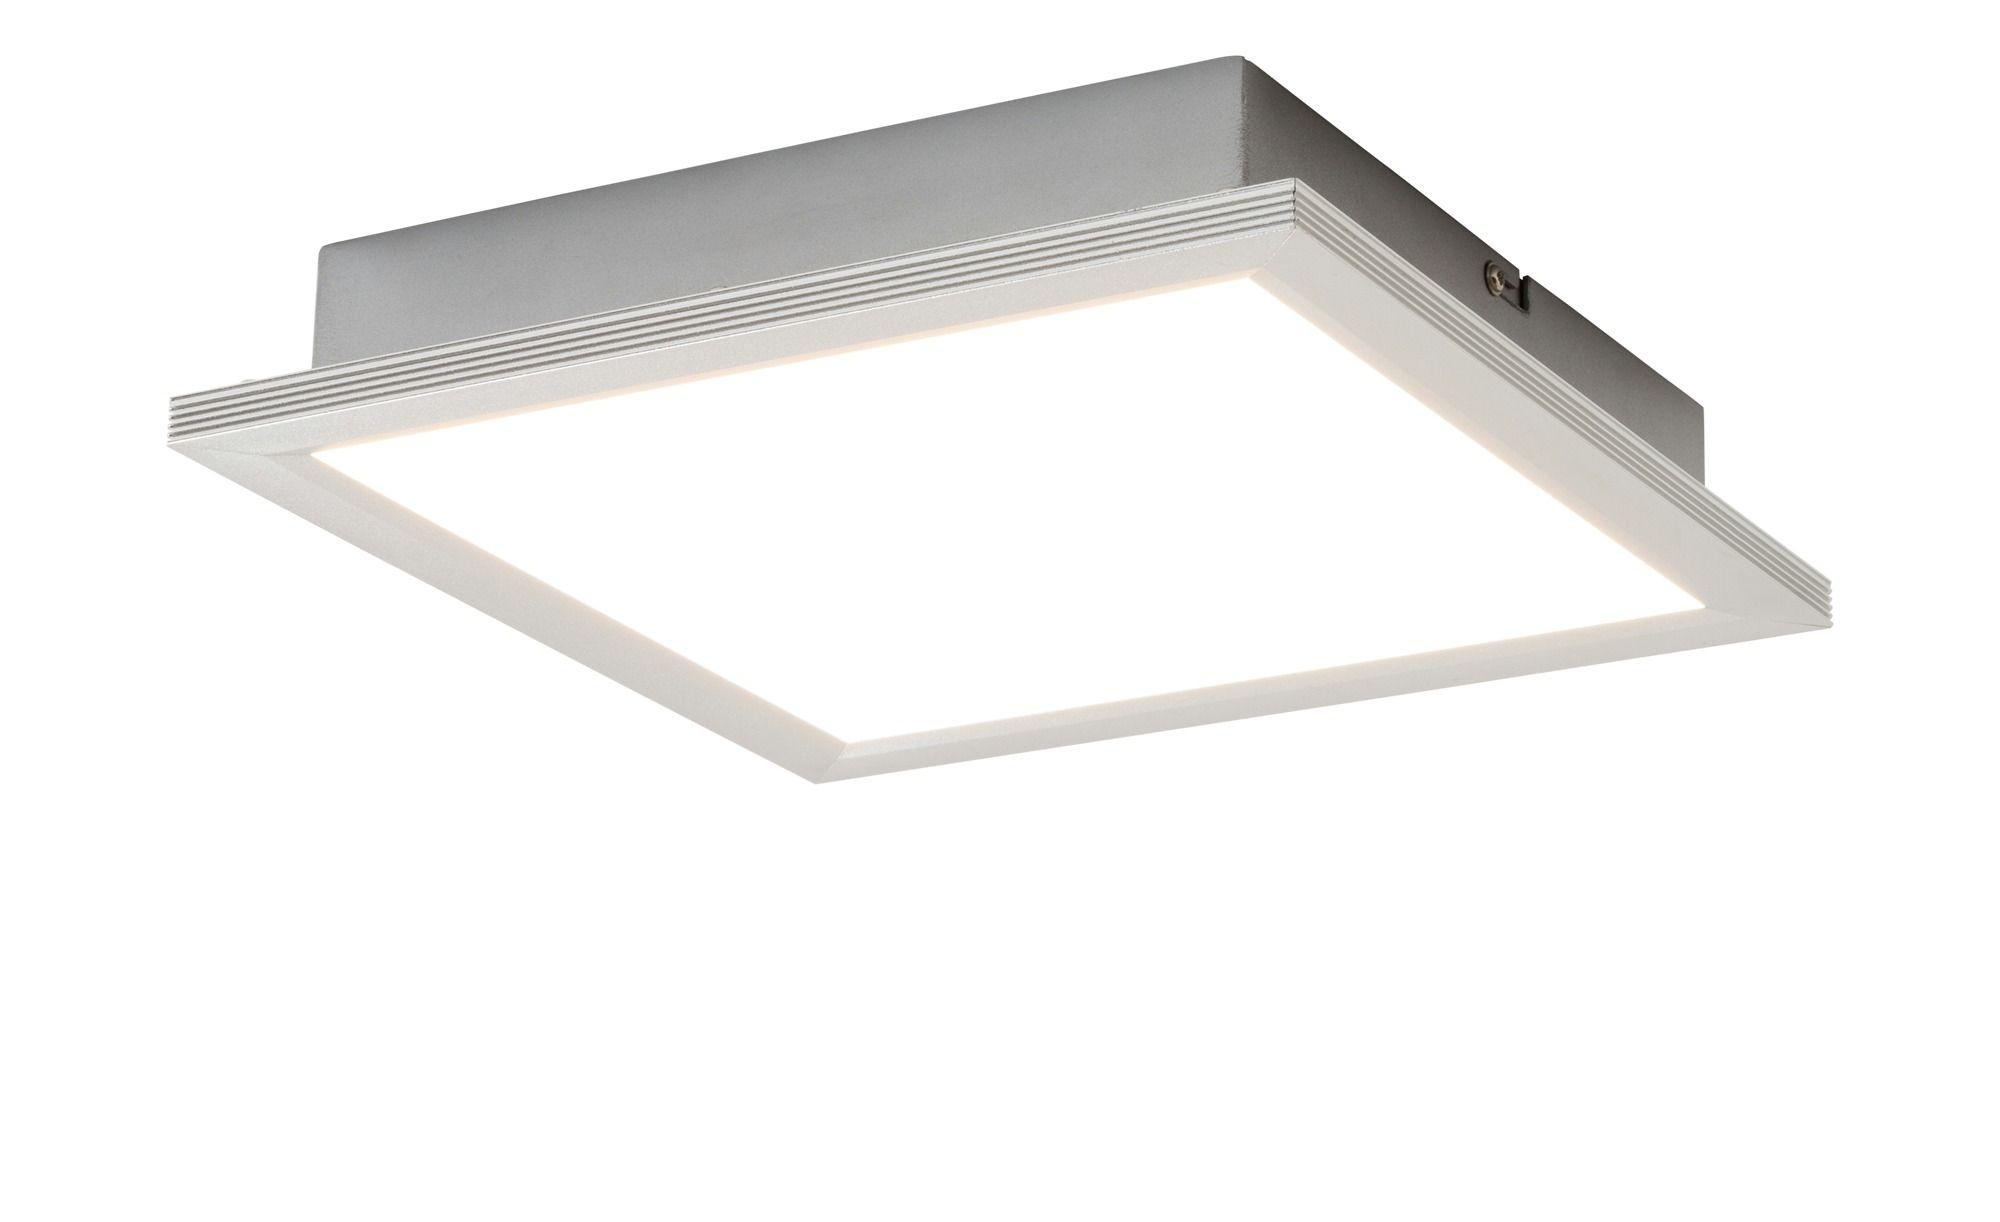 deckenlampe quadratisch led eben images oder eecffcdbcdaeca